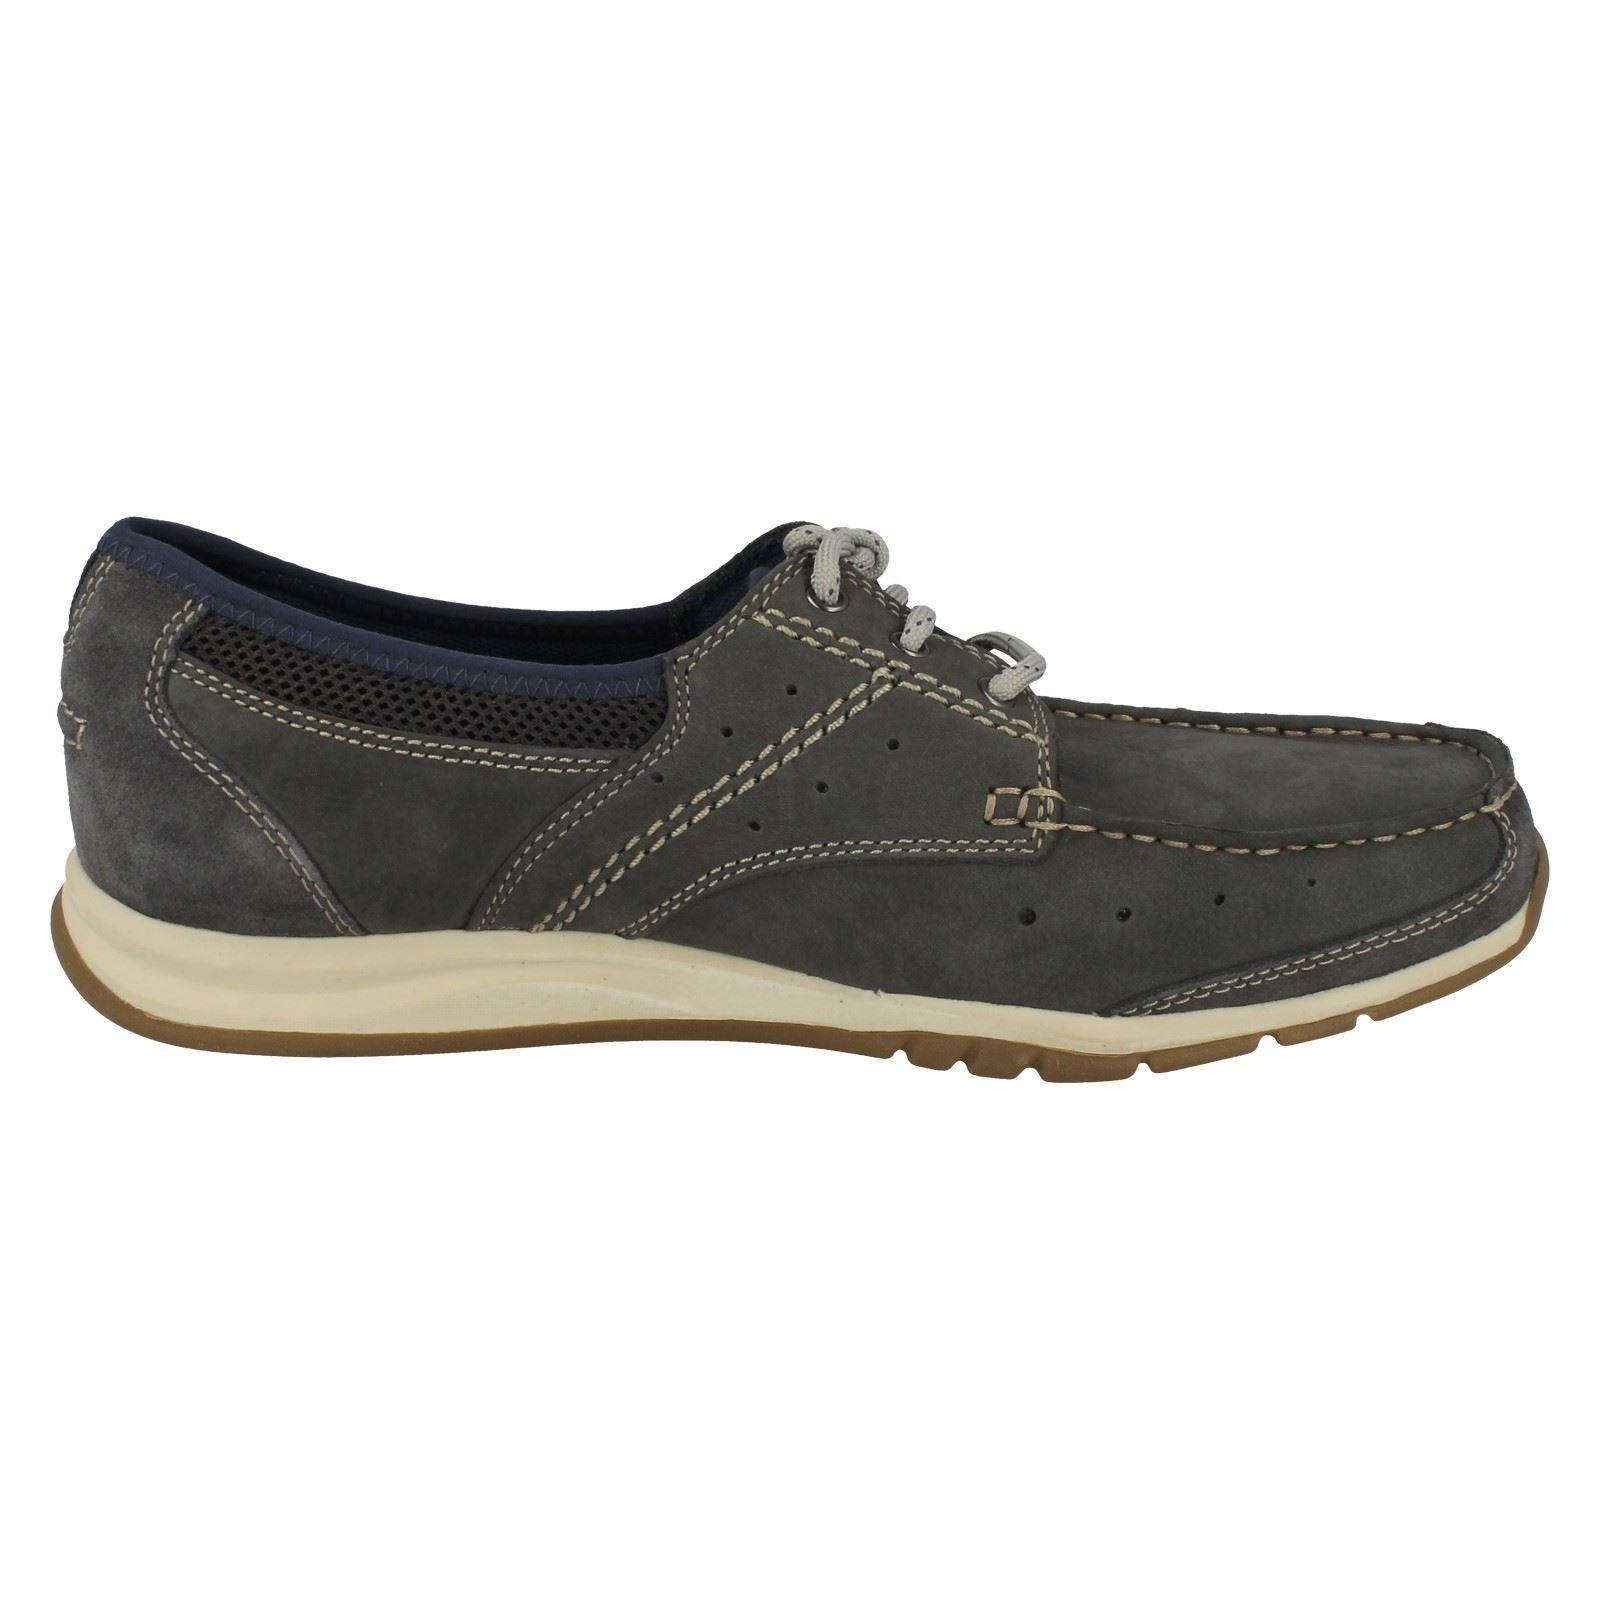 Uomo Clarks Clarks Uomo Moccasin Shoes 'Ramada English' 7c90b1